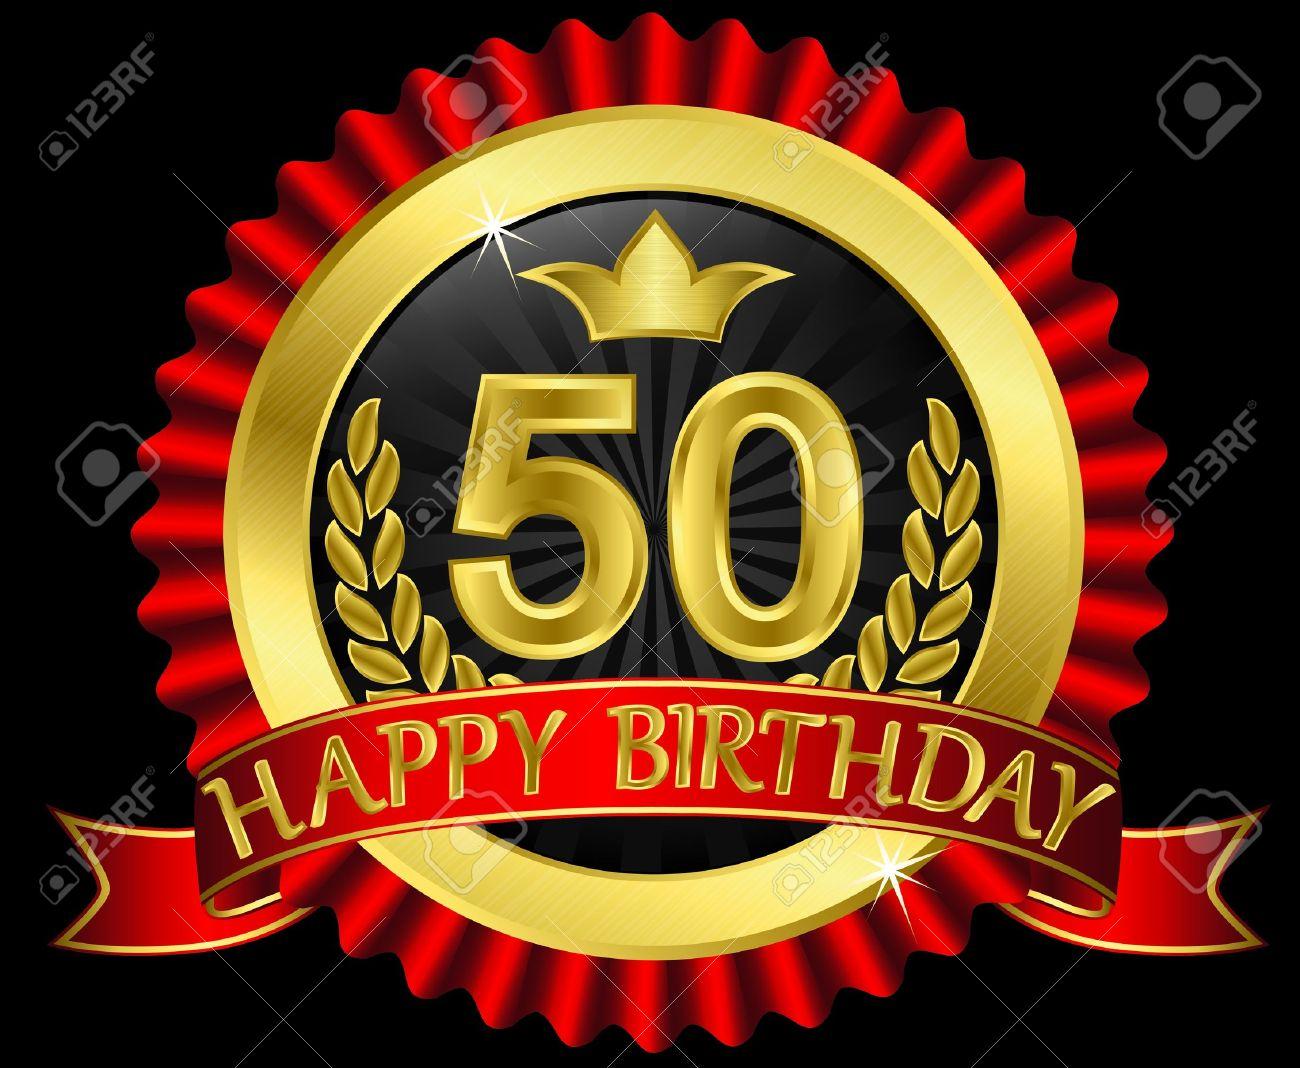 Ben noto 50 Years Happy Birthday Golden Label With Ribbons, Illustration  ZM94